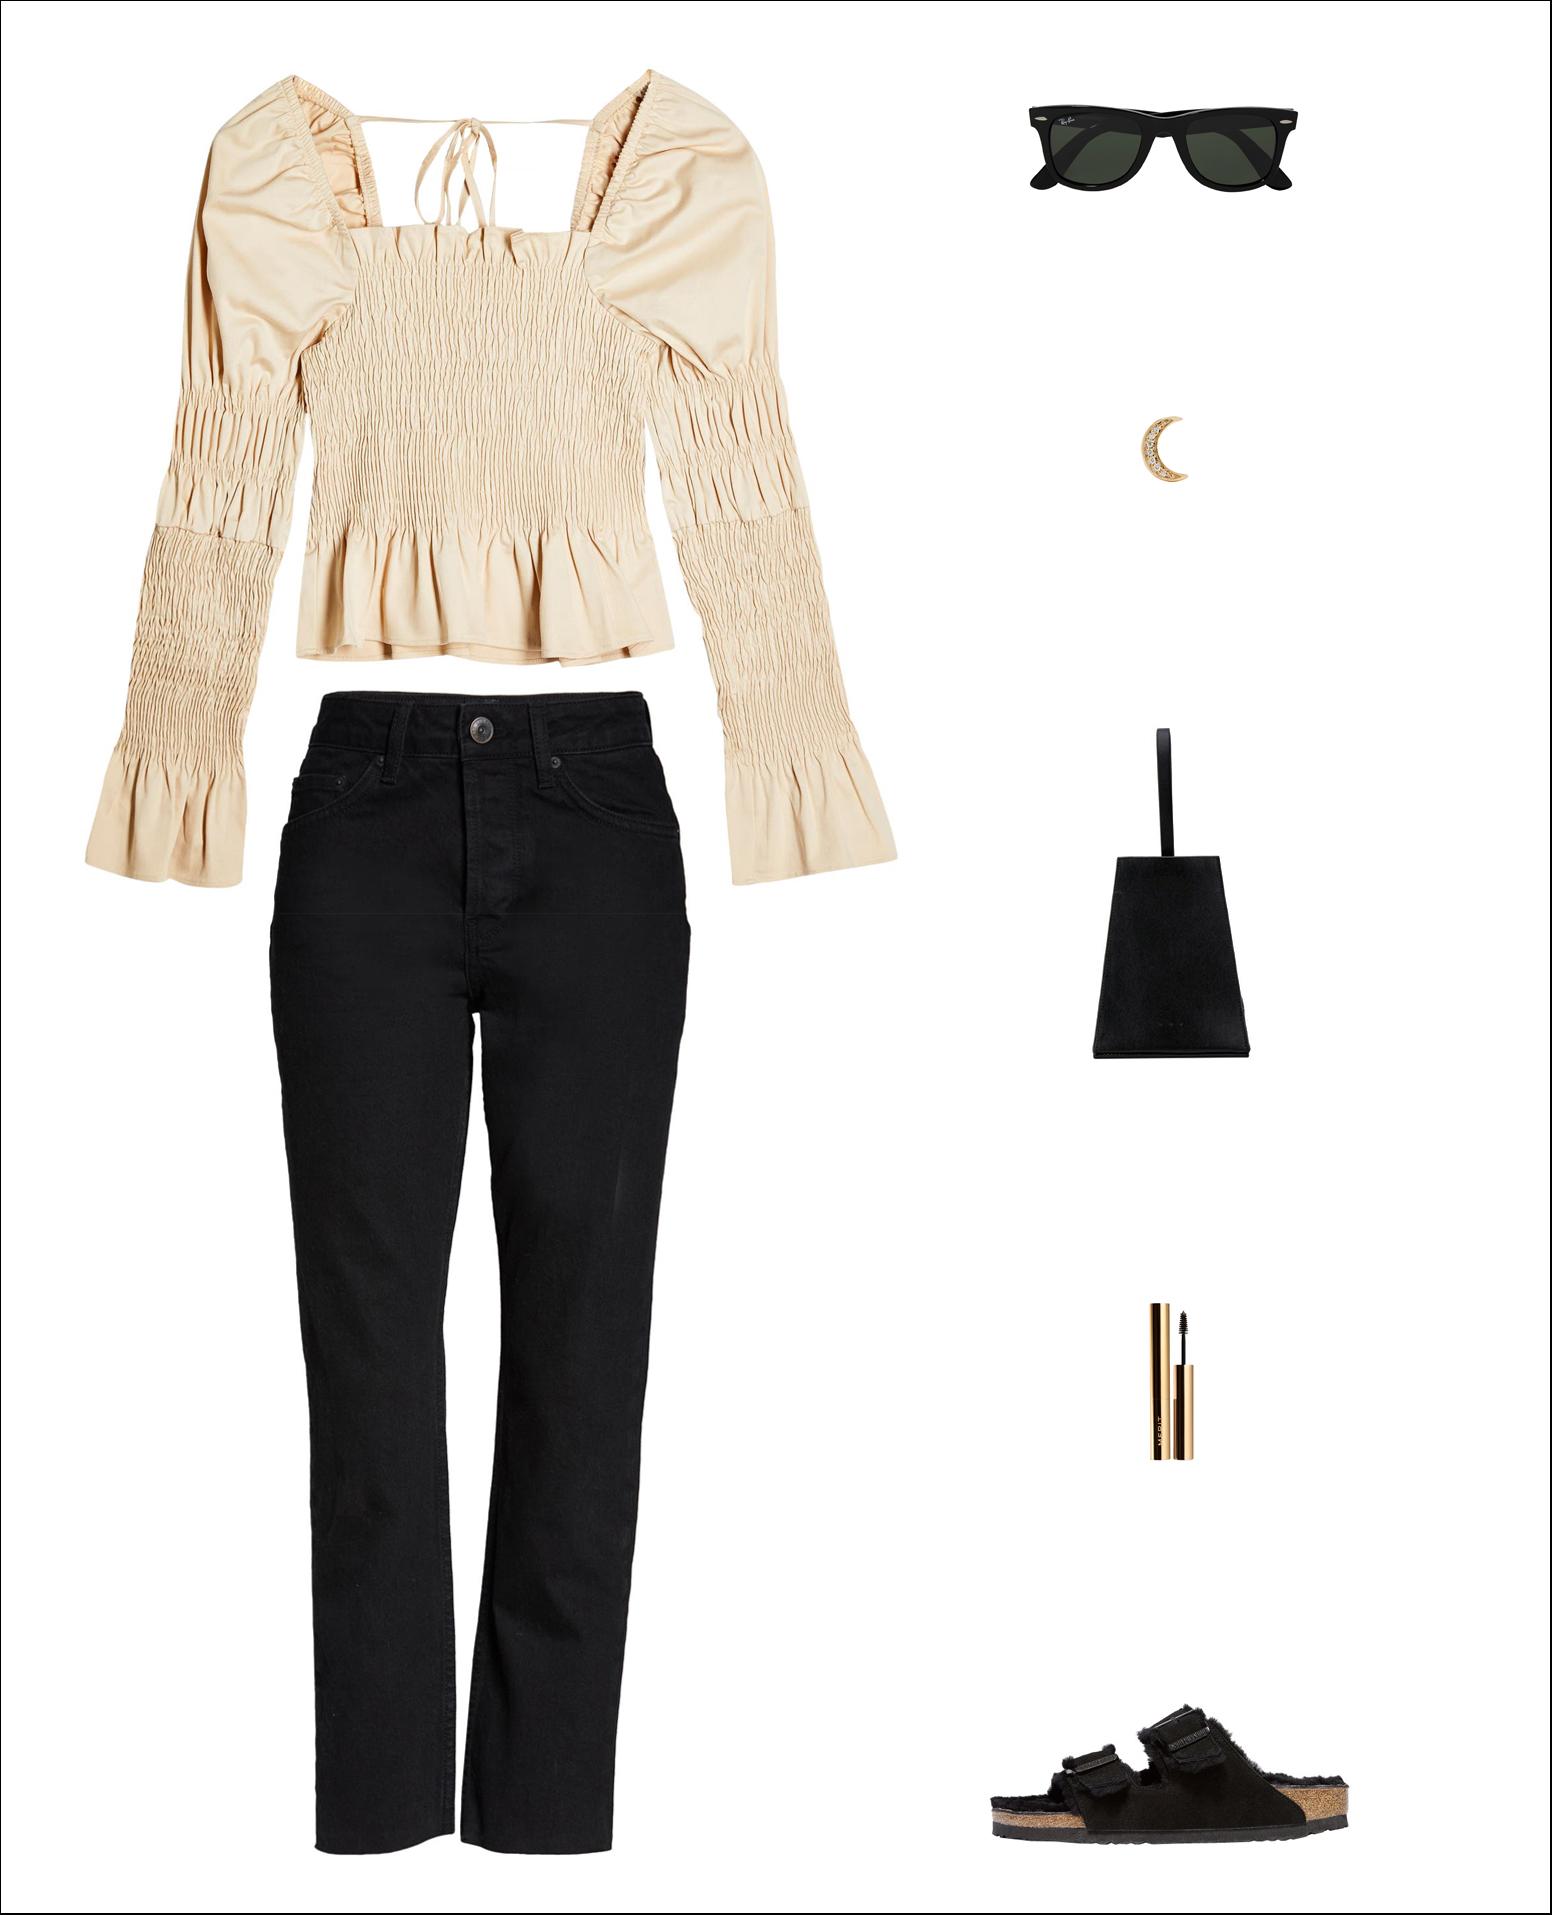 spring outfit idea with a neutral under-$100 ruffle sleeved top, wayfarer sunglasses, crescent moon earring, mini black bag, under-$100 black jeans, Merit brow gel, Birkenstock Arizona shearling slide sandals